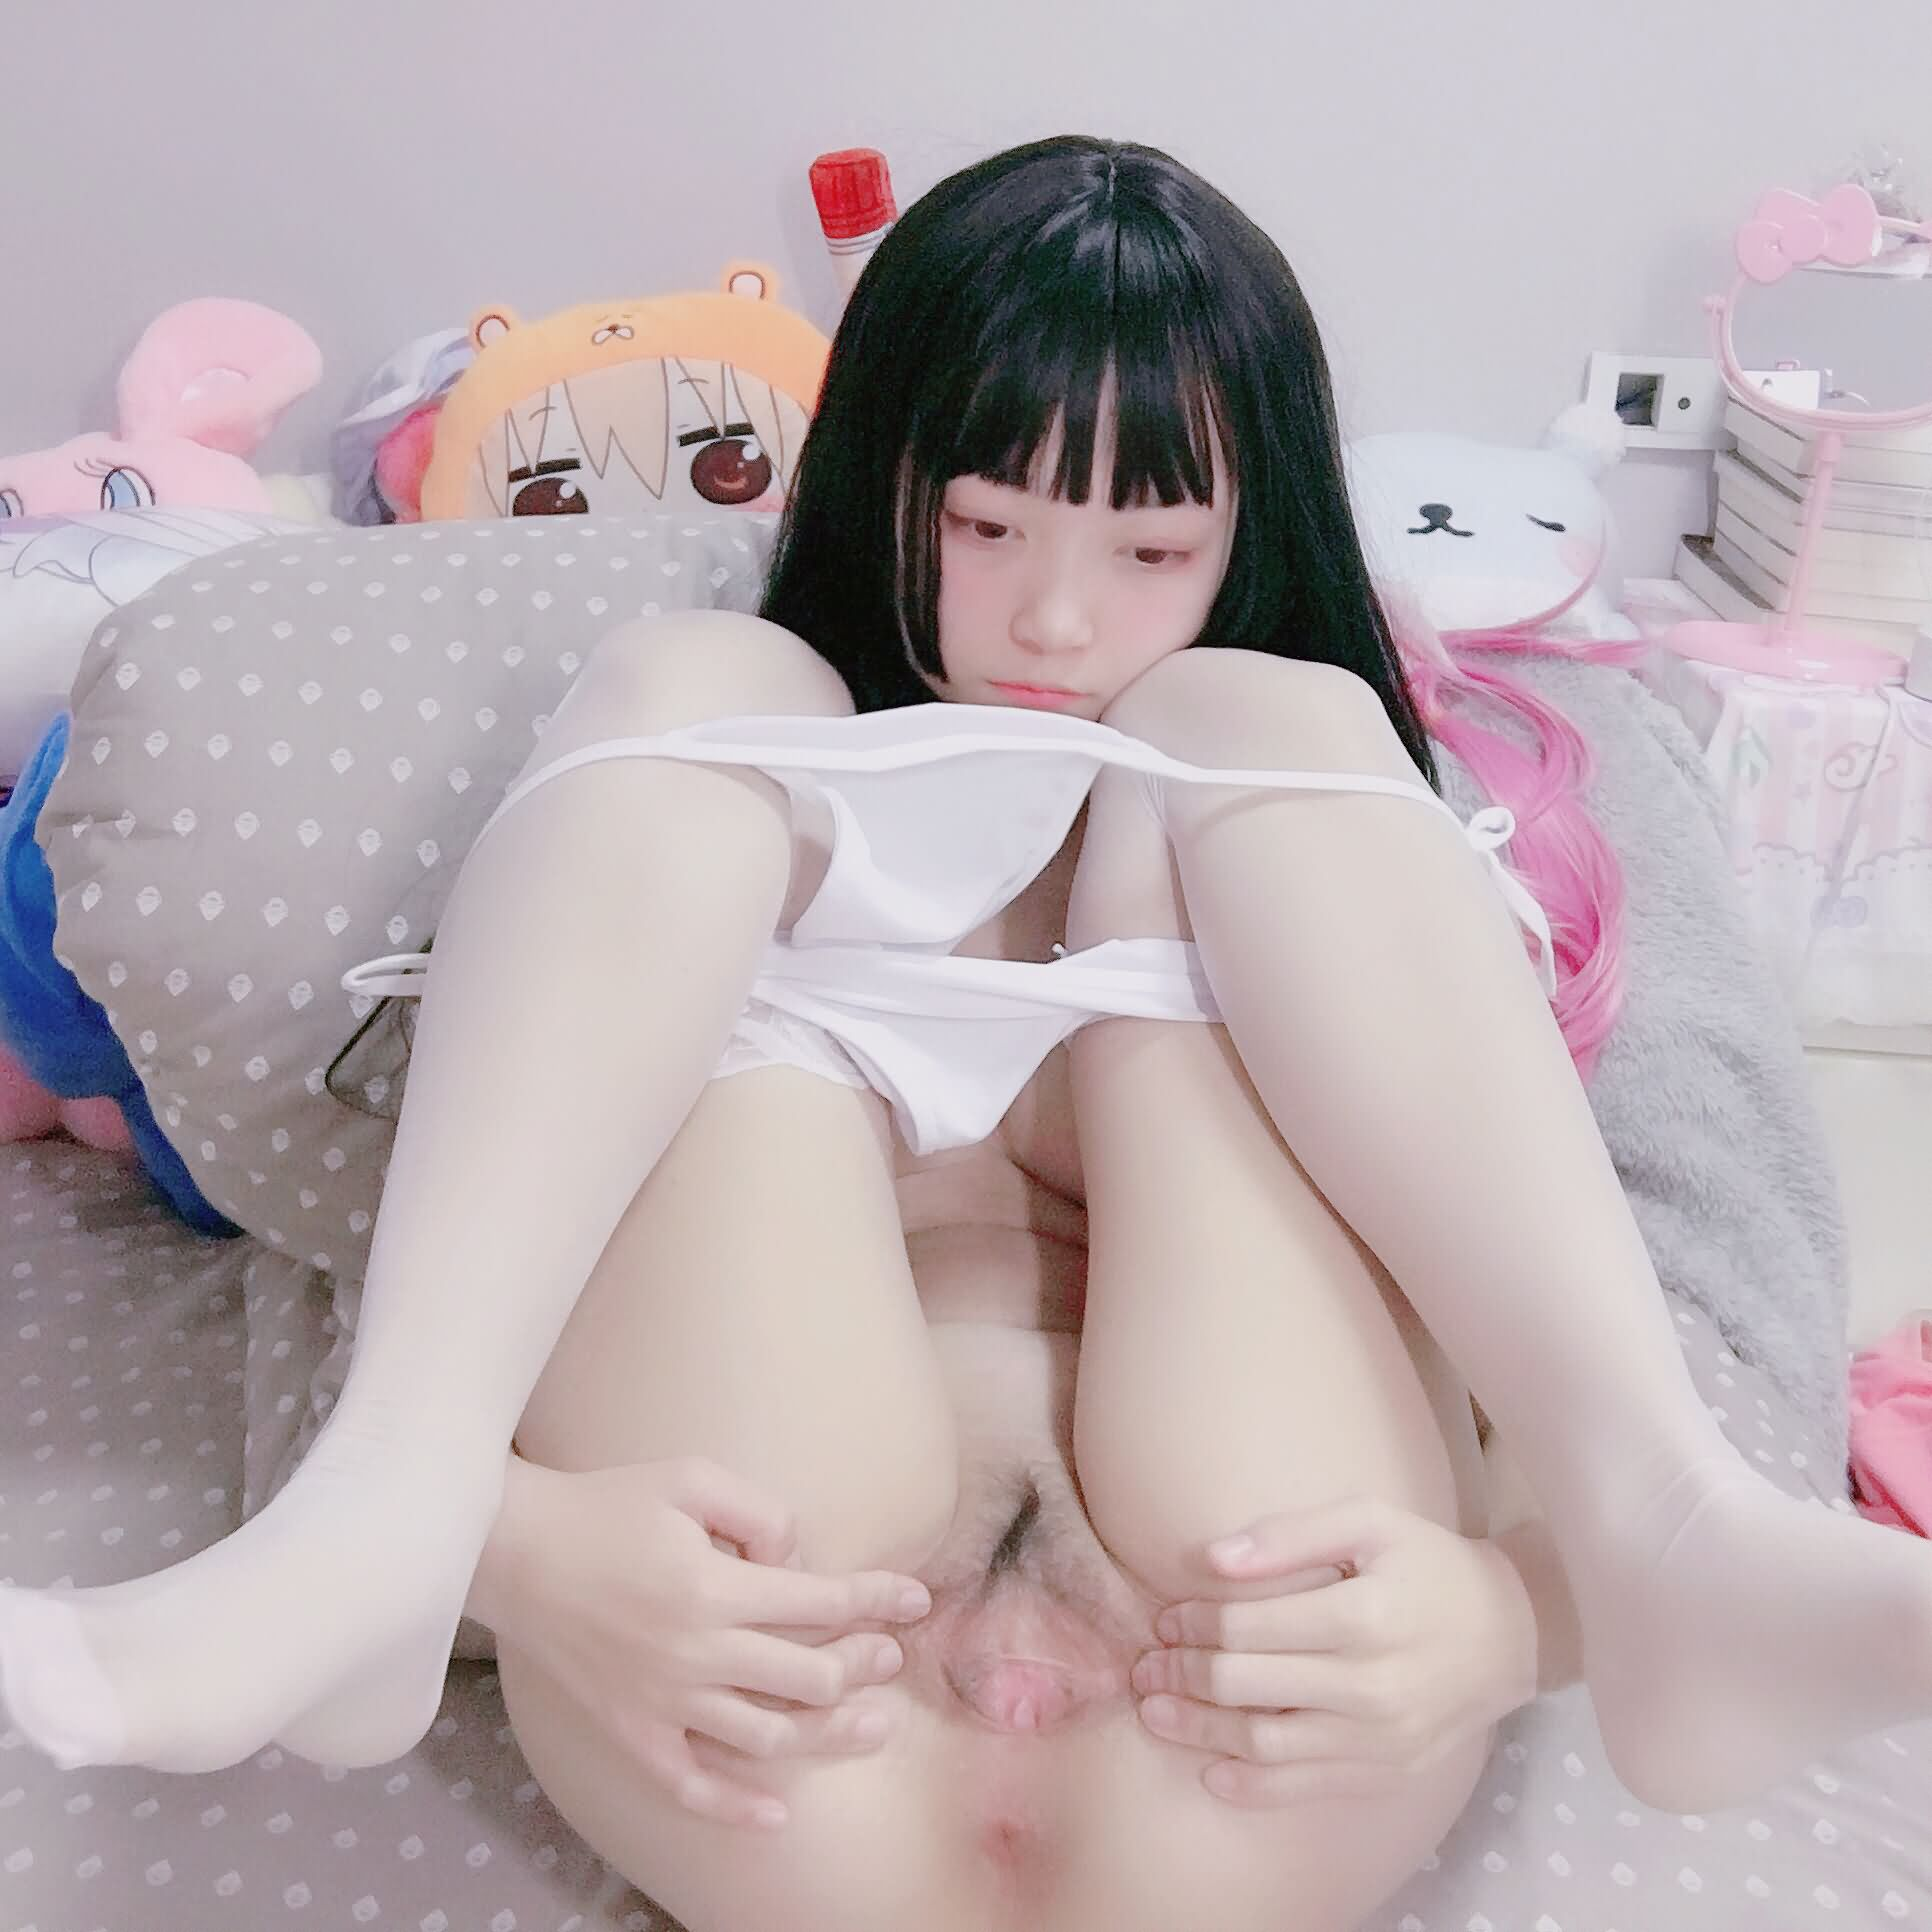 Jq4ziR - Preview预览 Cute girl PR社 露脸福利姬小奈奈 黑丝兔女郎 46P